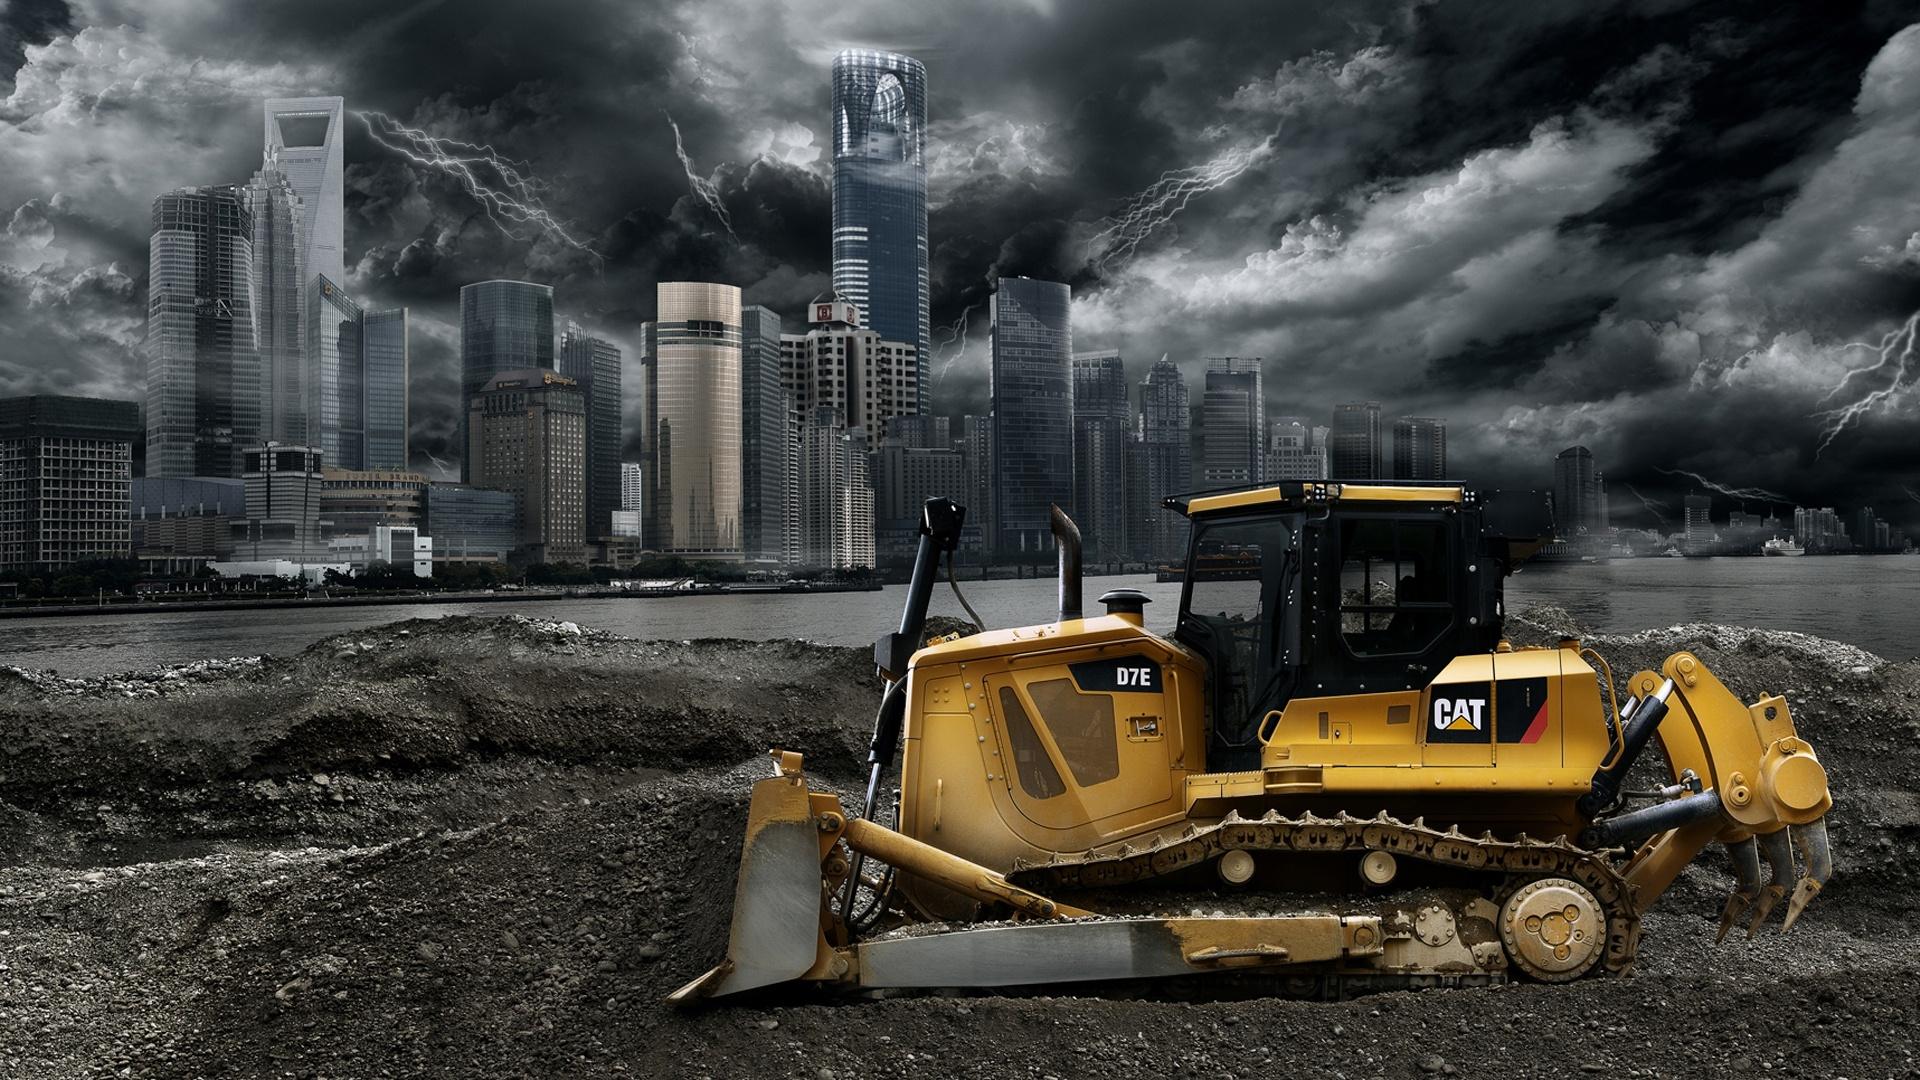 Caterpillar D7E bulldozer car caterpillar city cloud d7e gray 1920x1080